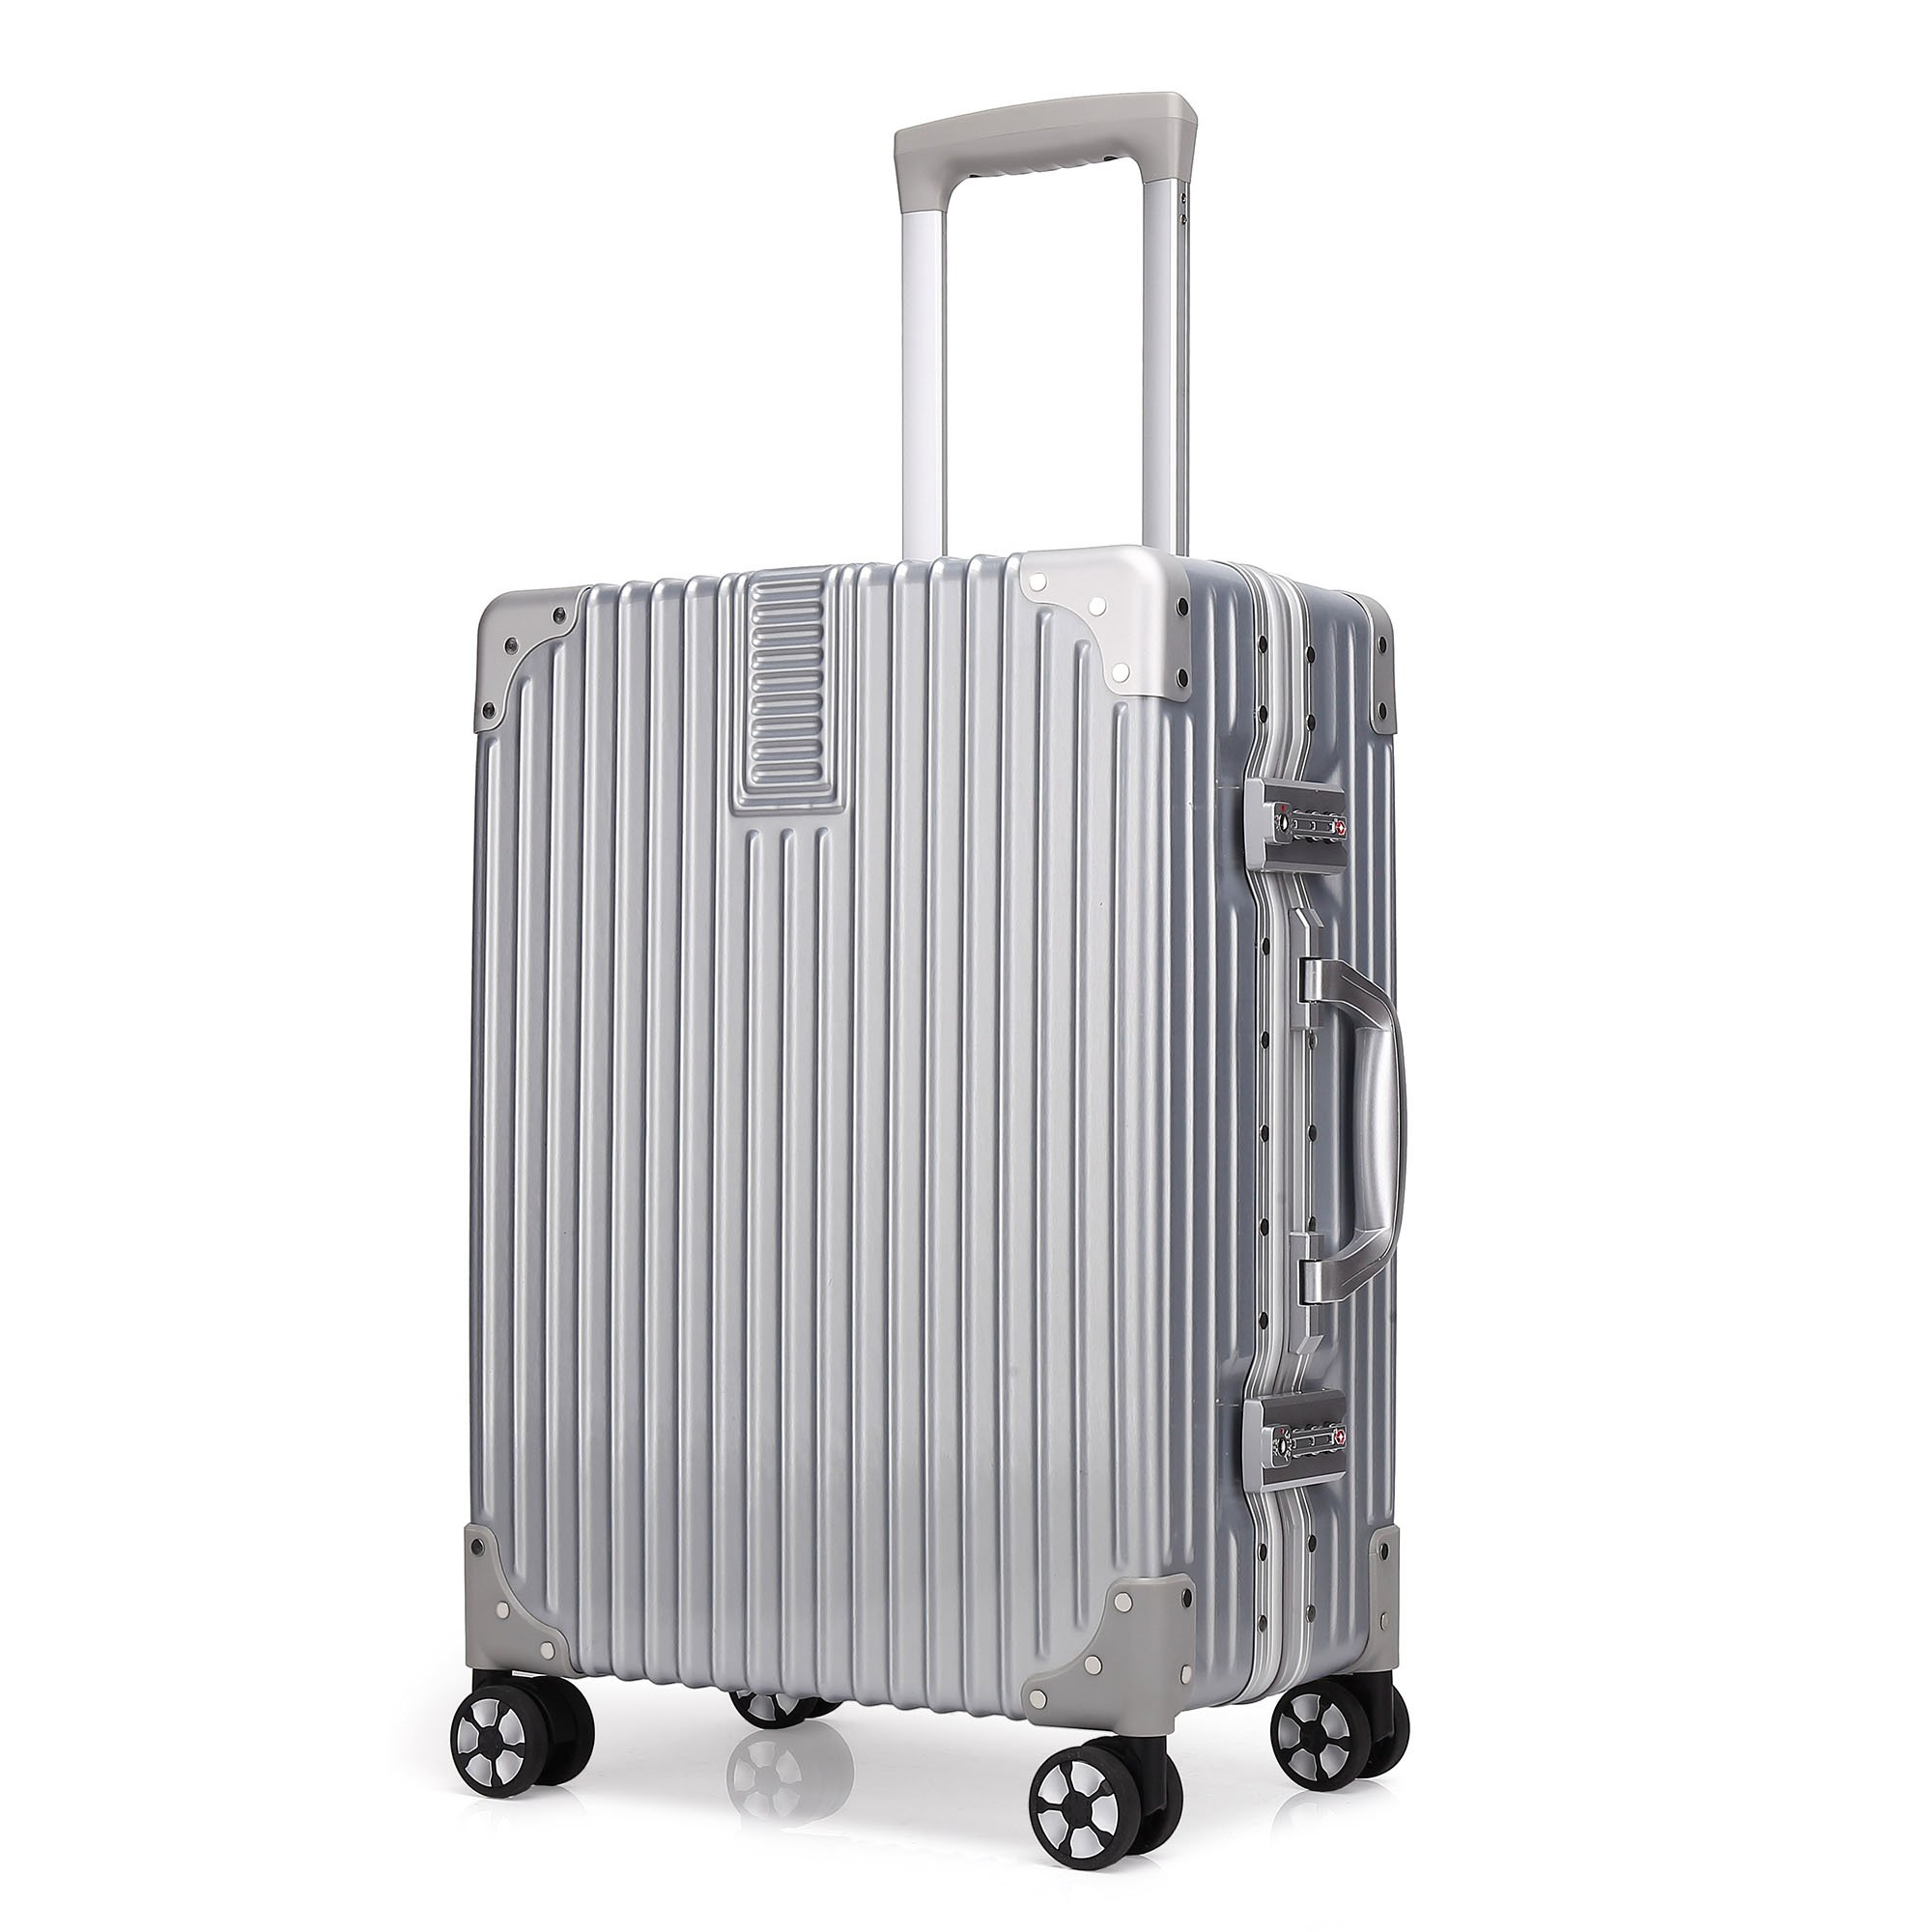 Kroeus スーツケース 大型 軽量 人気 キャリーケース 旅行用品 出張 TSAロック搭載 機内持込可 大容量 耐衝撃 ヘアライン仕上げ 4輪ダブルキャスター 静音 s シルバー